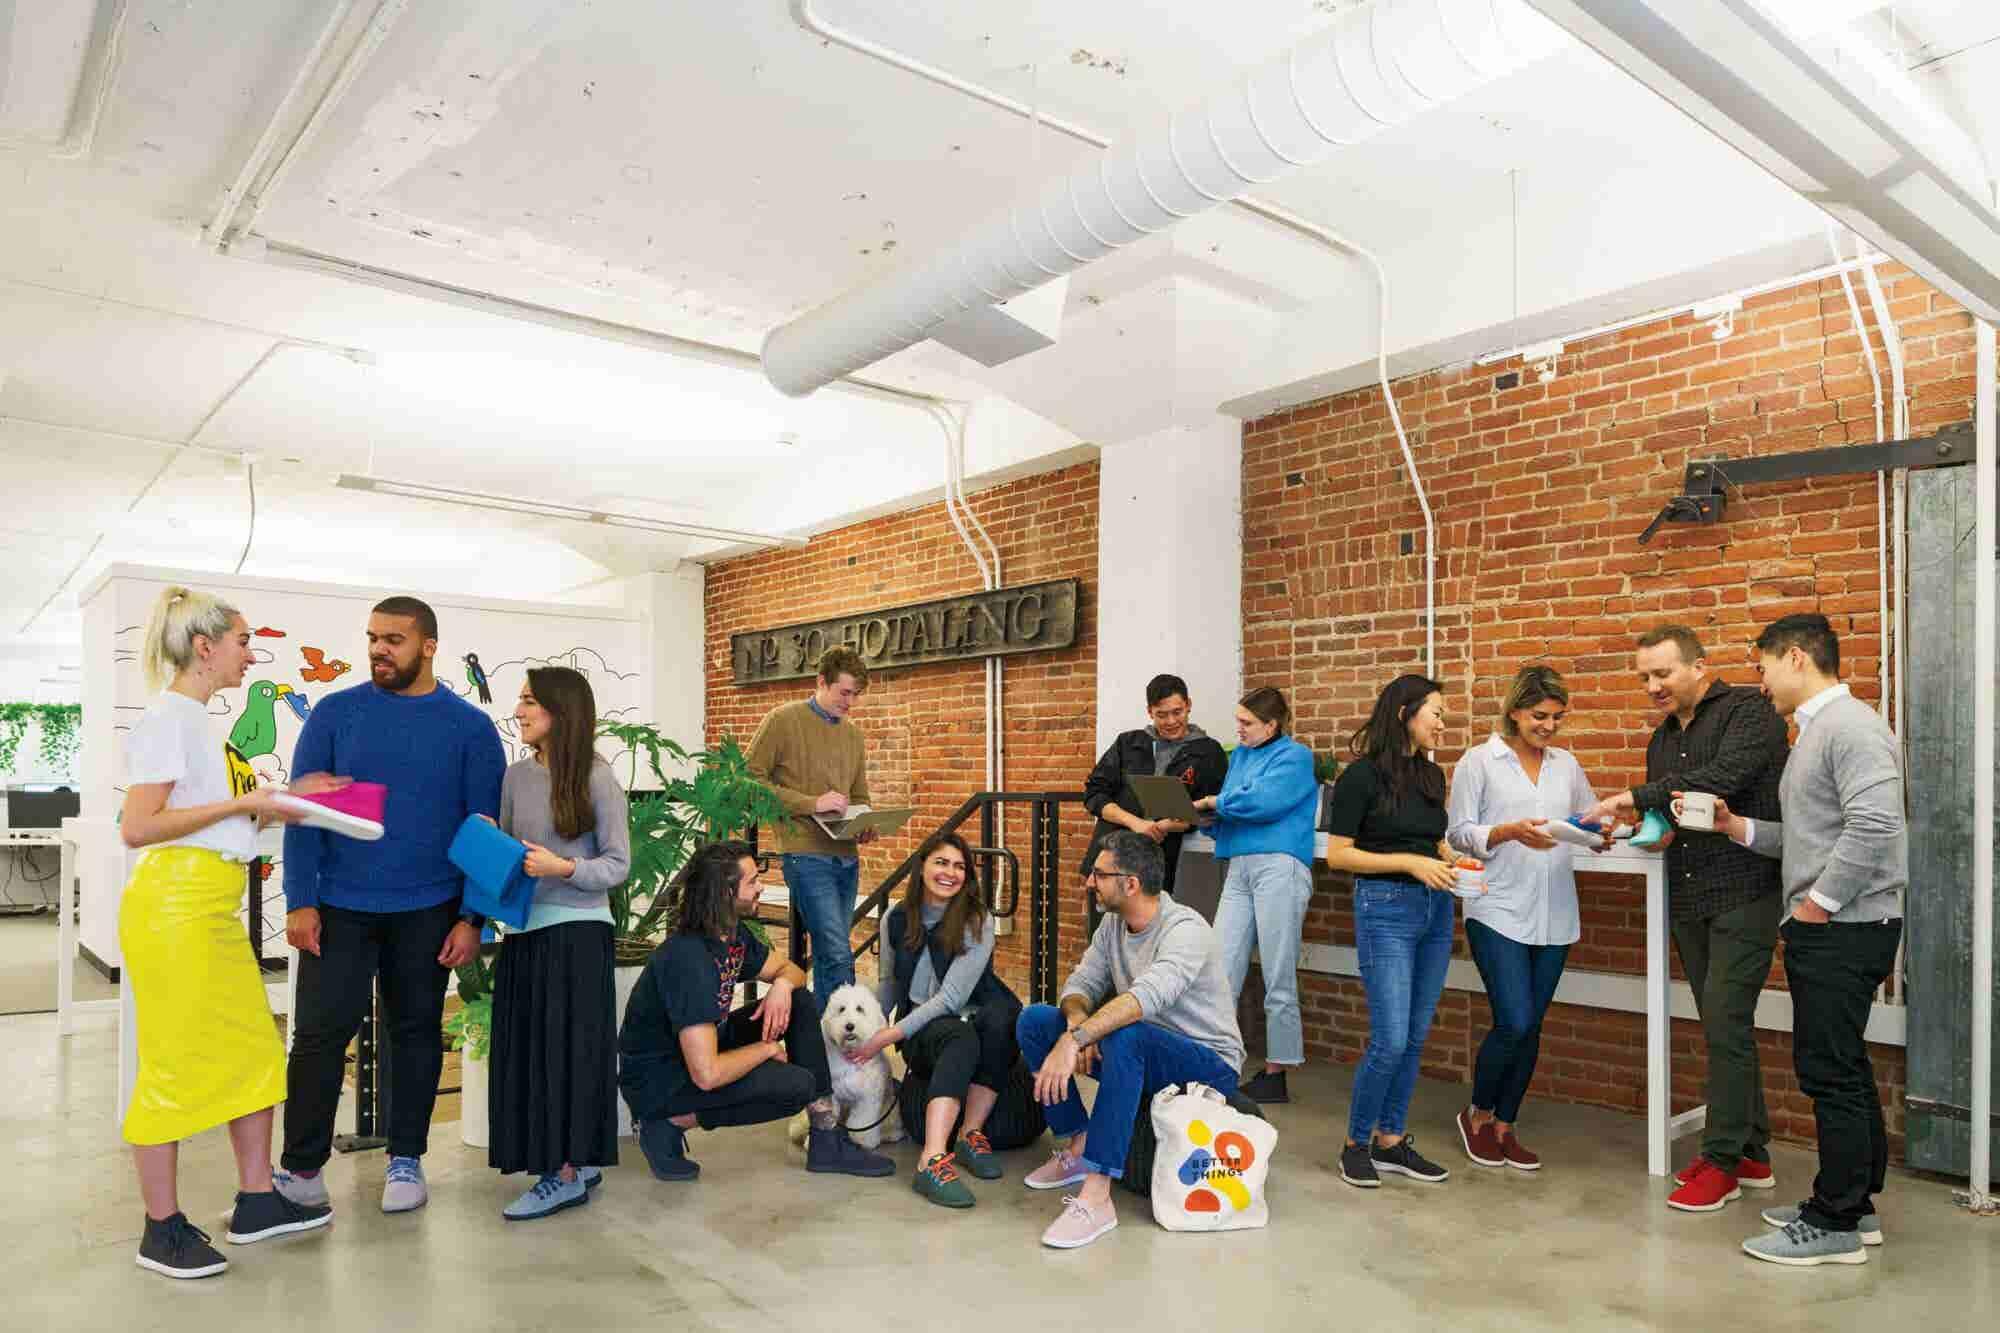 Allbirds' San Francisco HQ Celebrates the Past But Looks to the Future